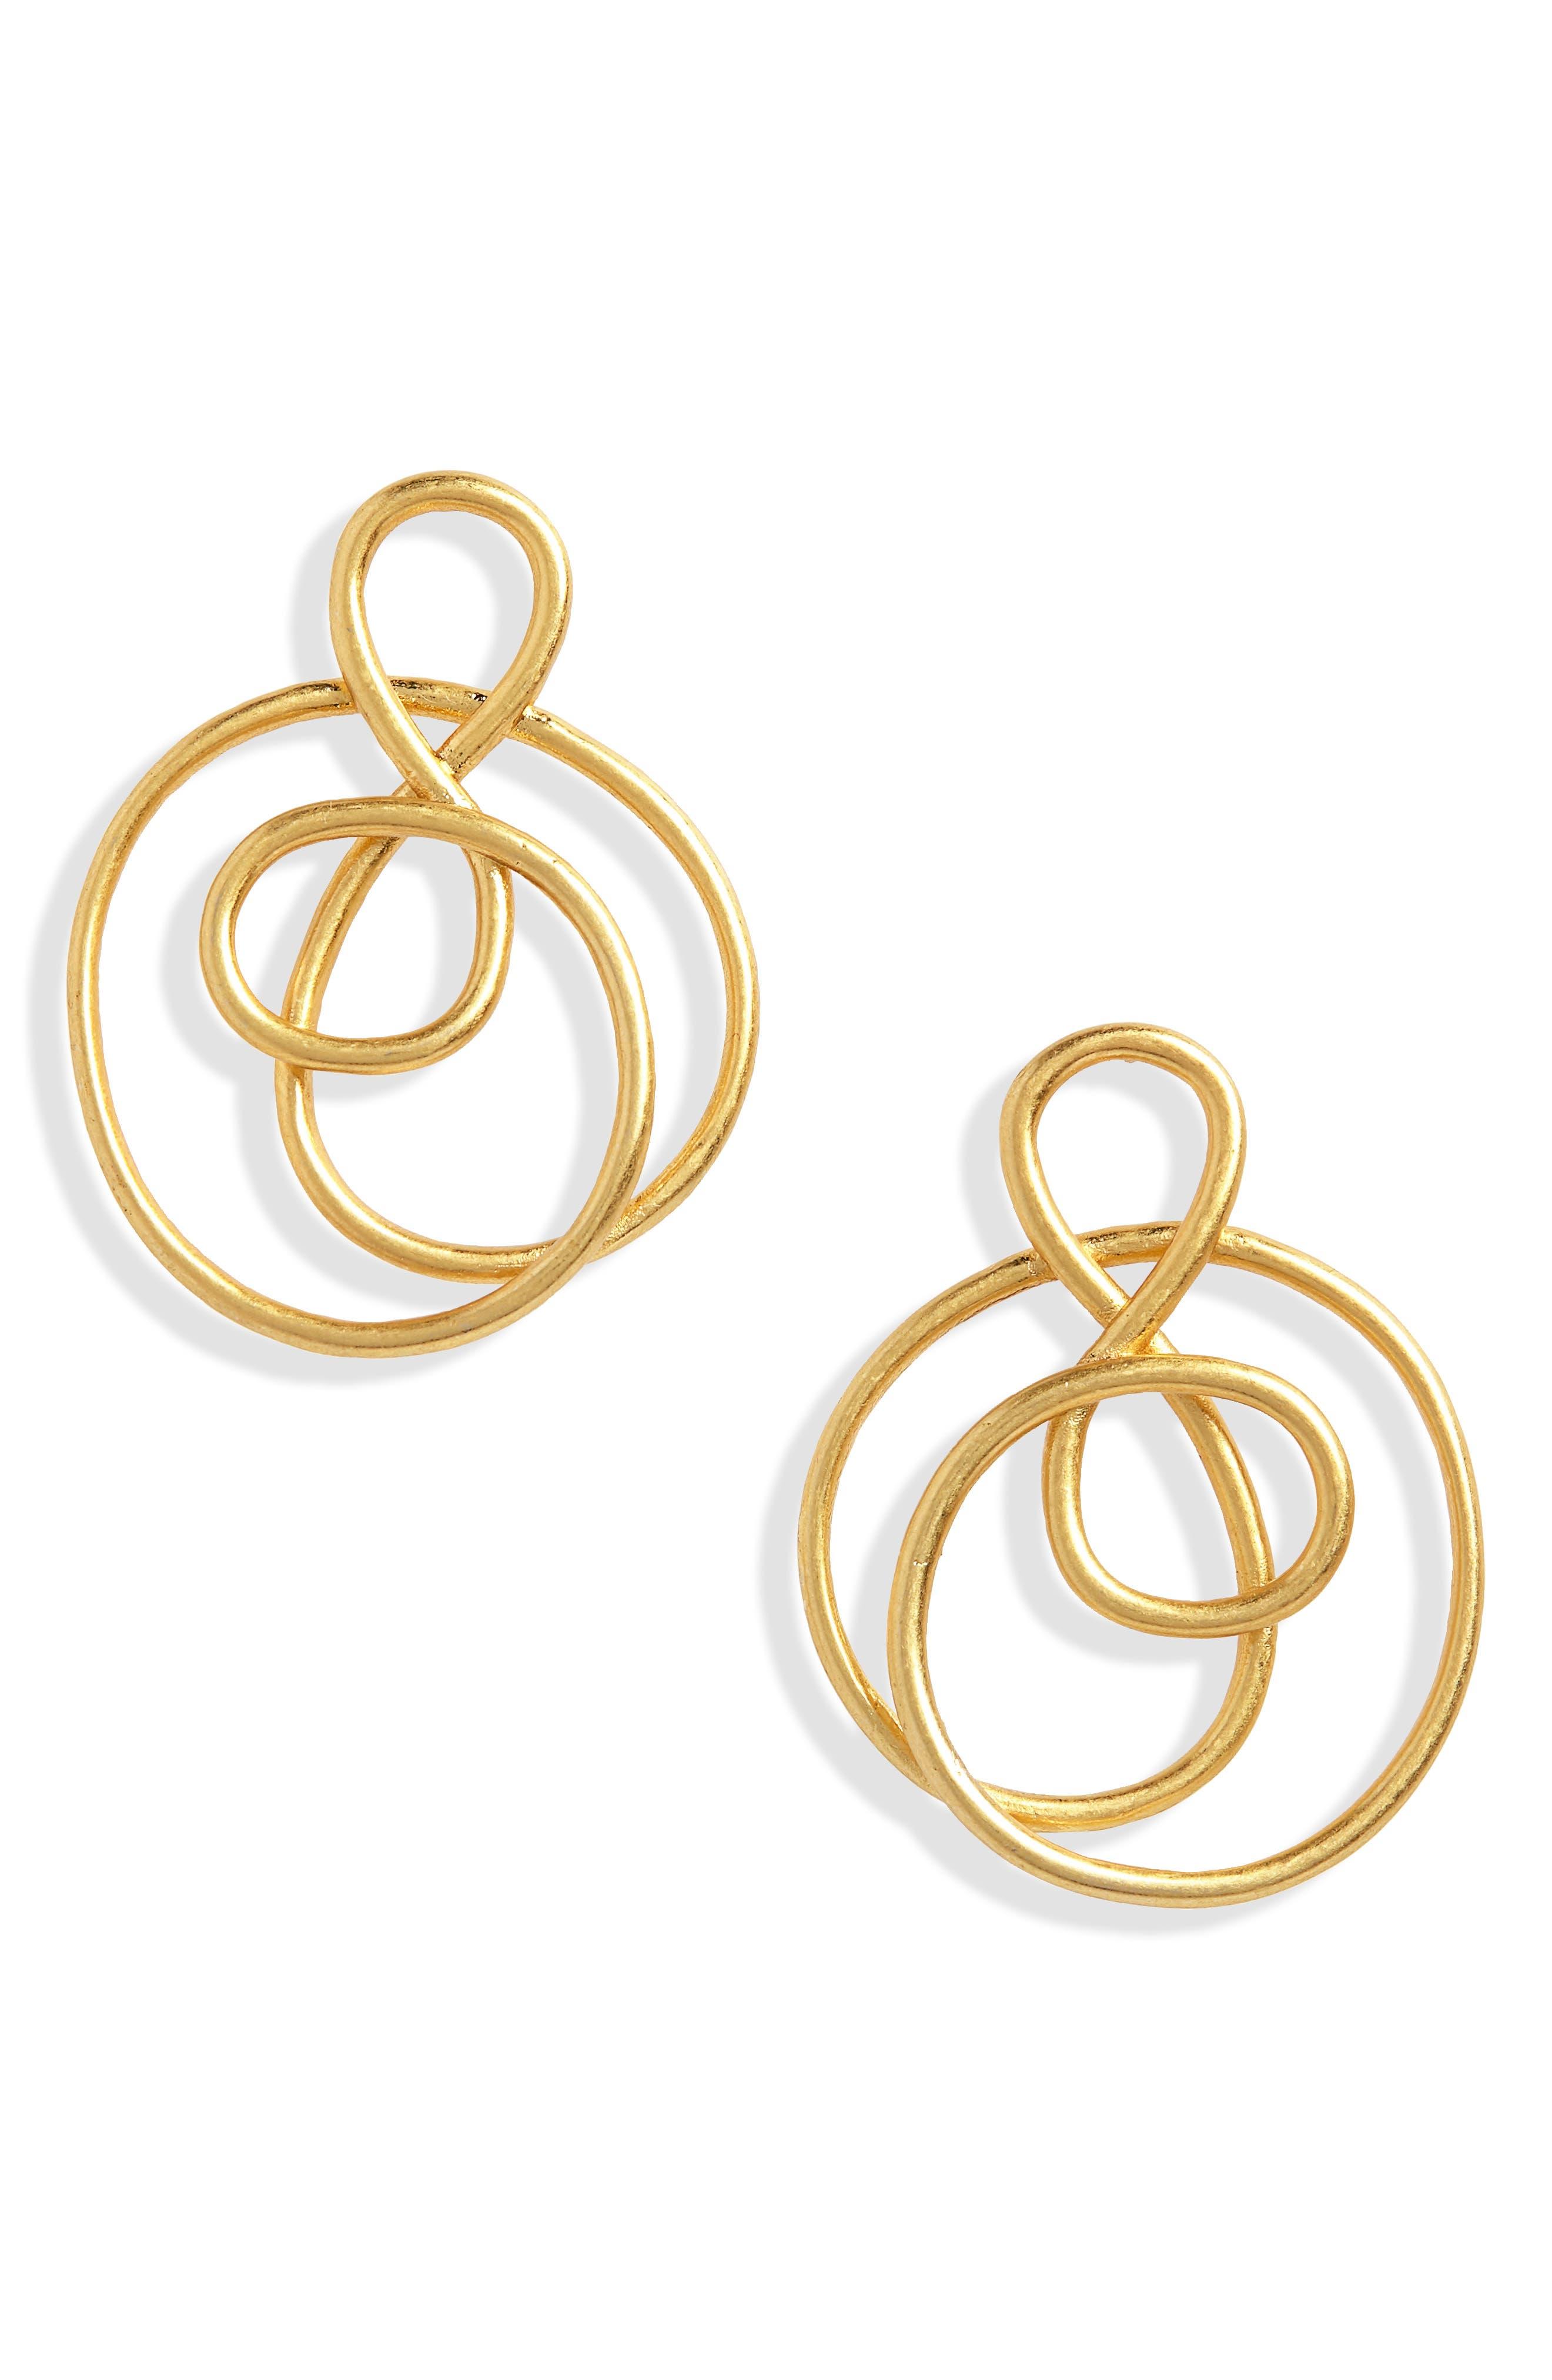 Treble Twist Earrings,                             Main thumbnail 1, color,                             VINTAGE GOLD